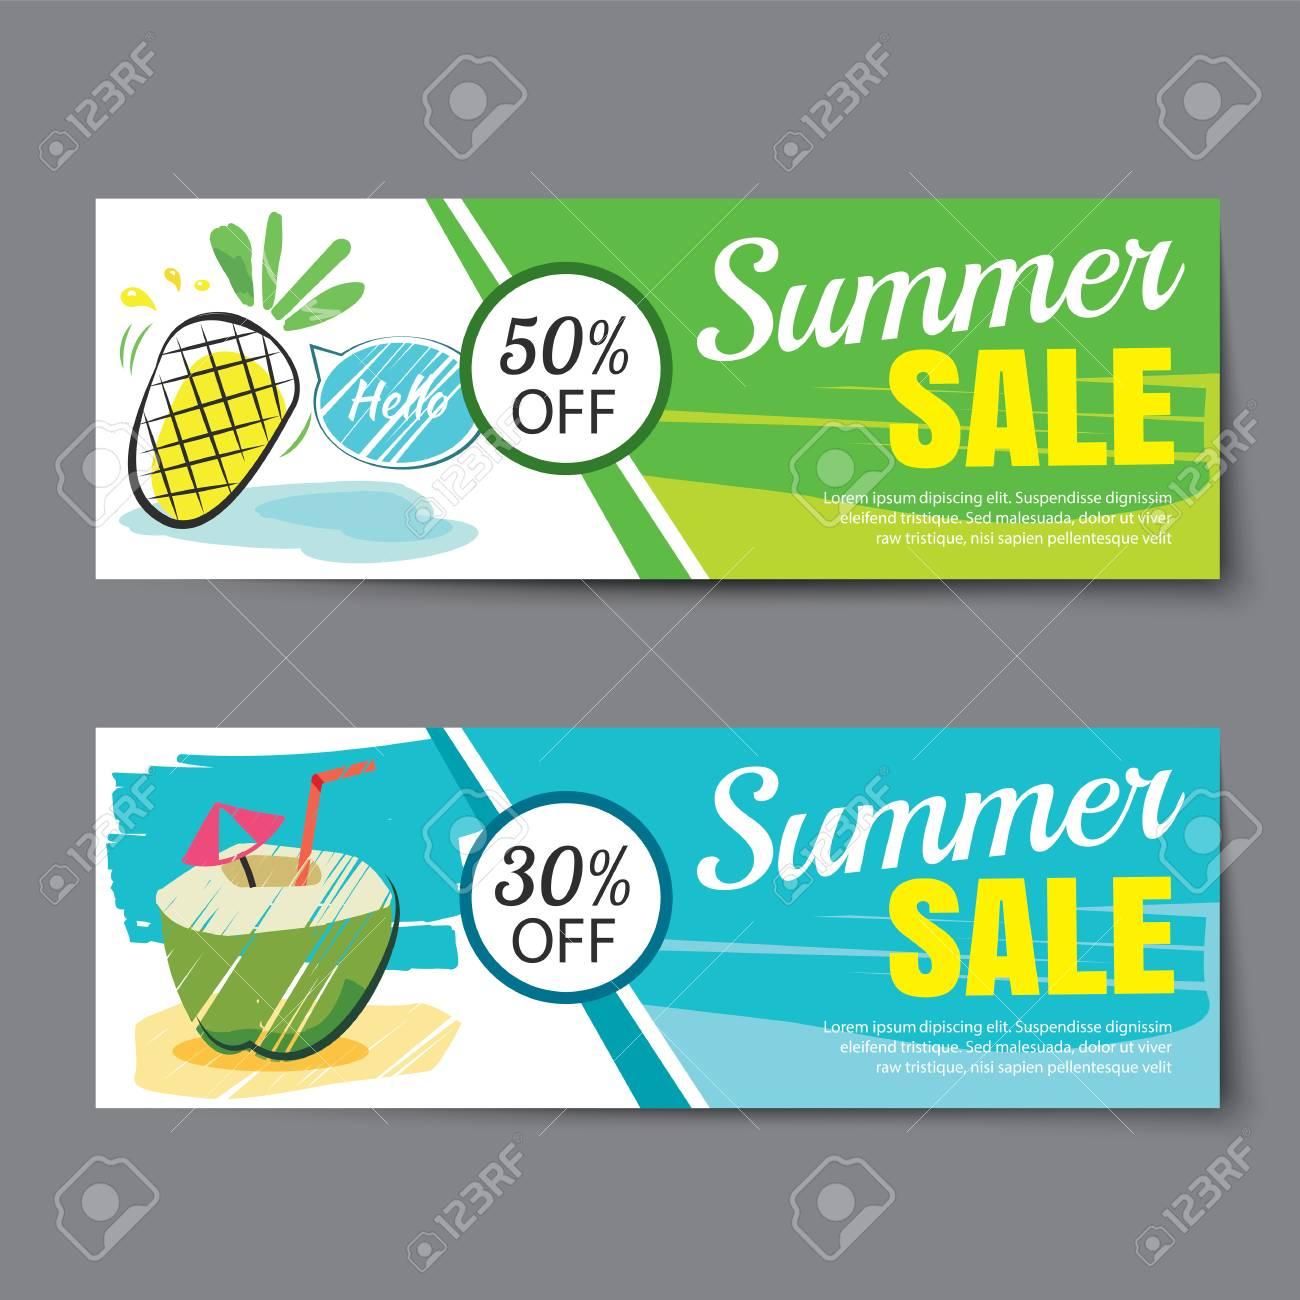 Summer Sale Voucher Template Discount Coupon Banner Hand Drawn